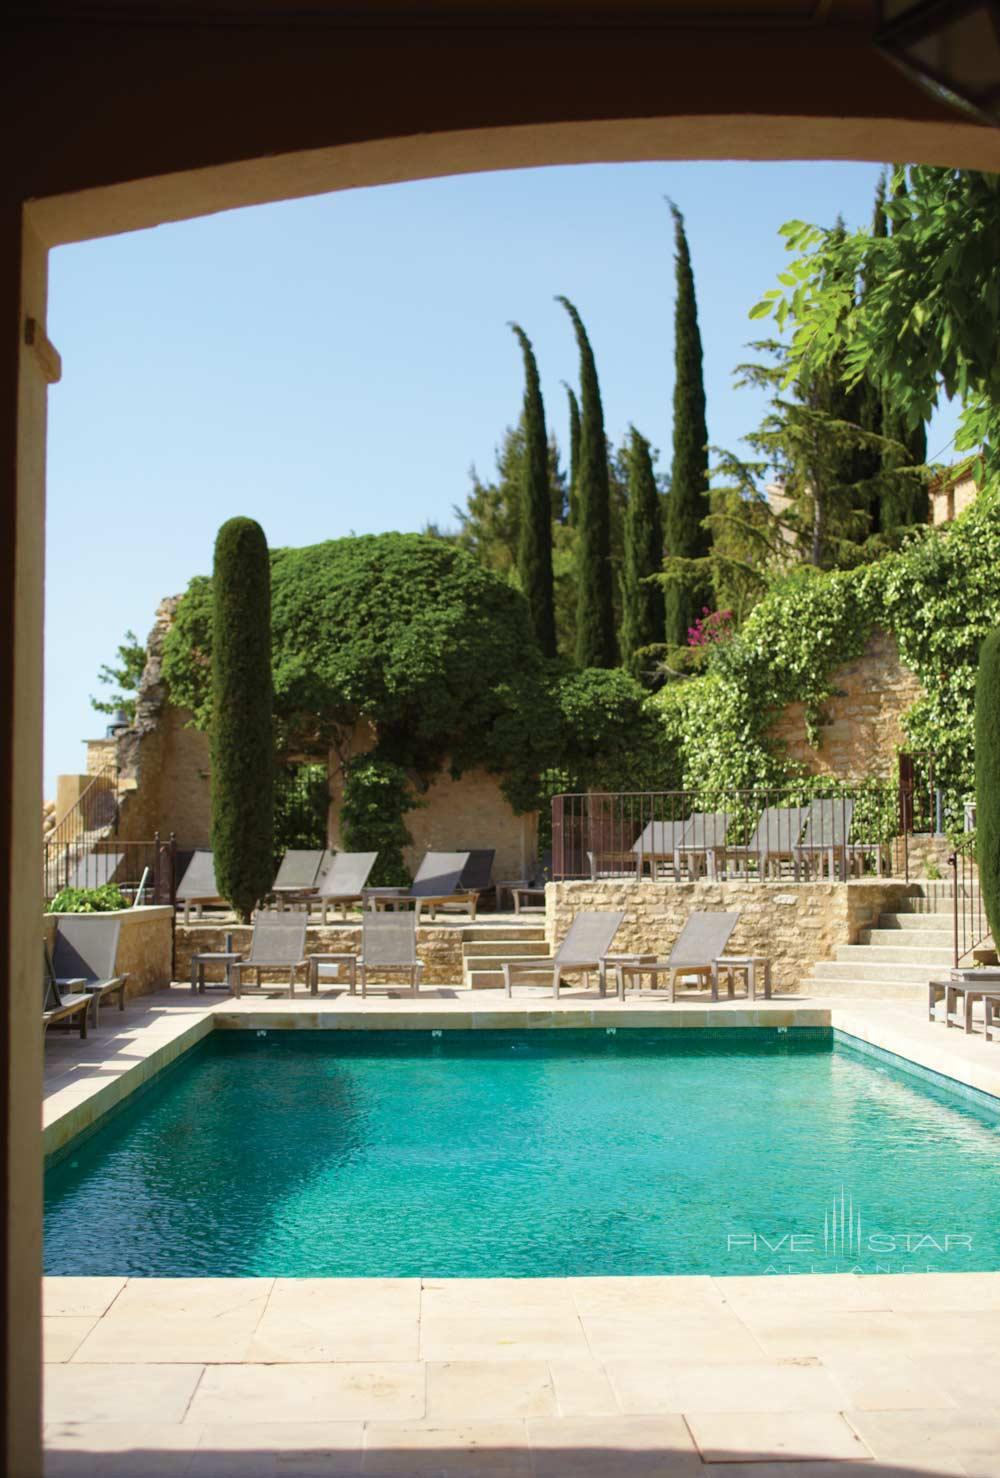 Outdoor Pool at Hotel Crillon Le Brave